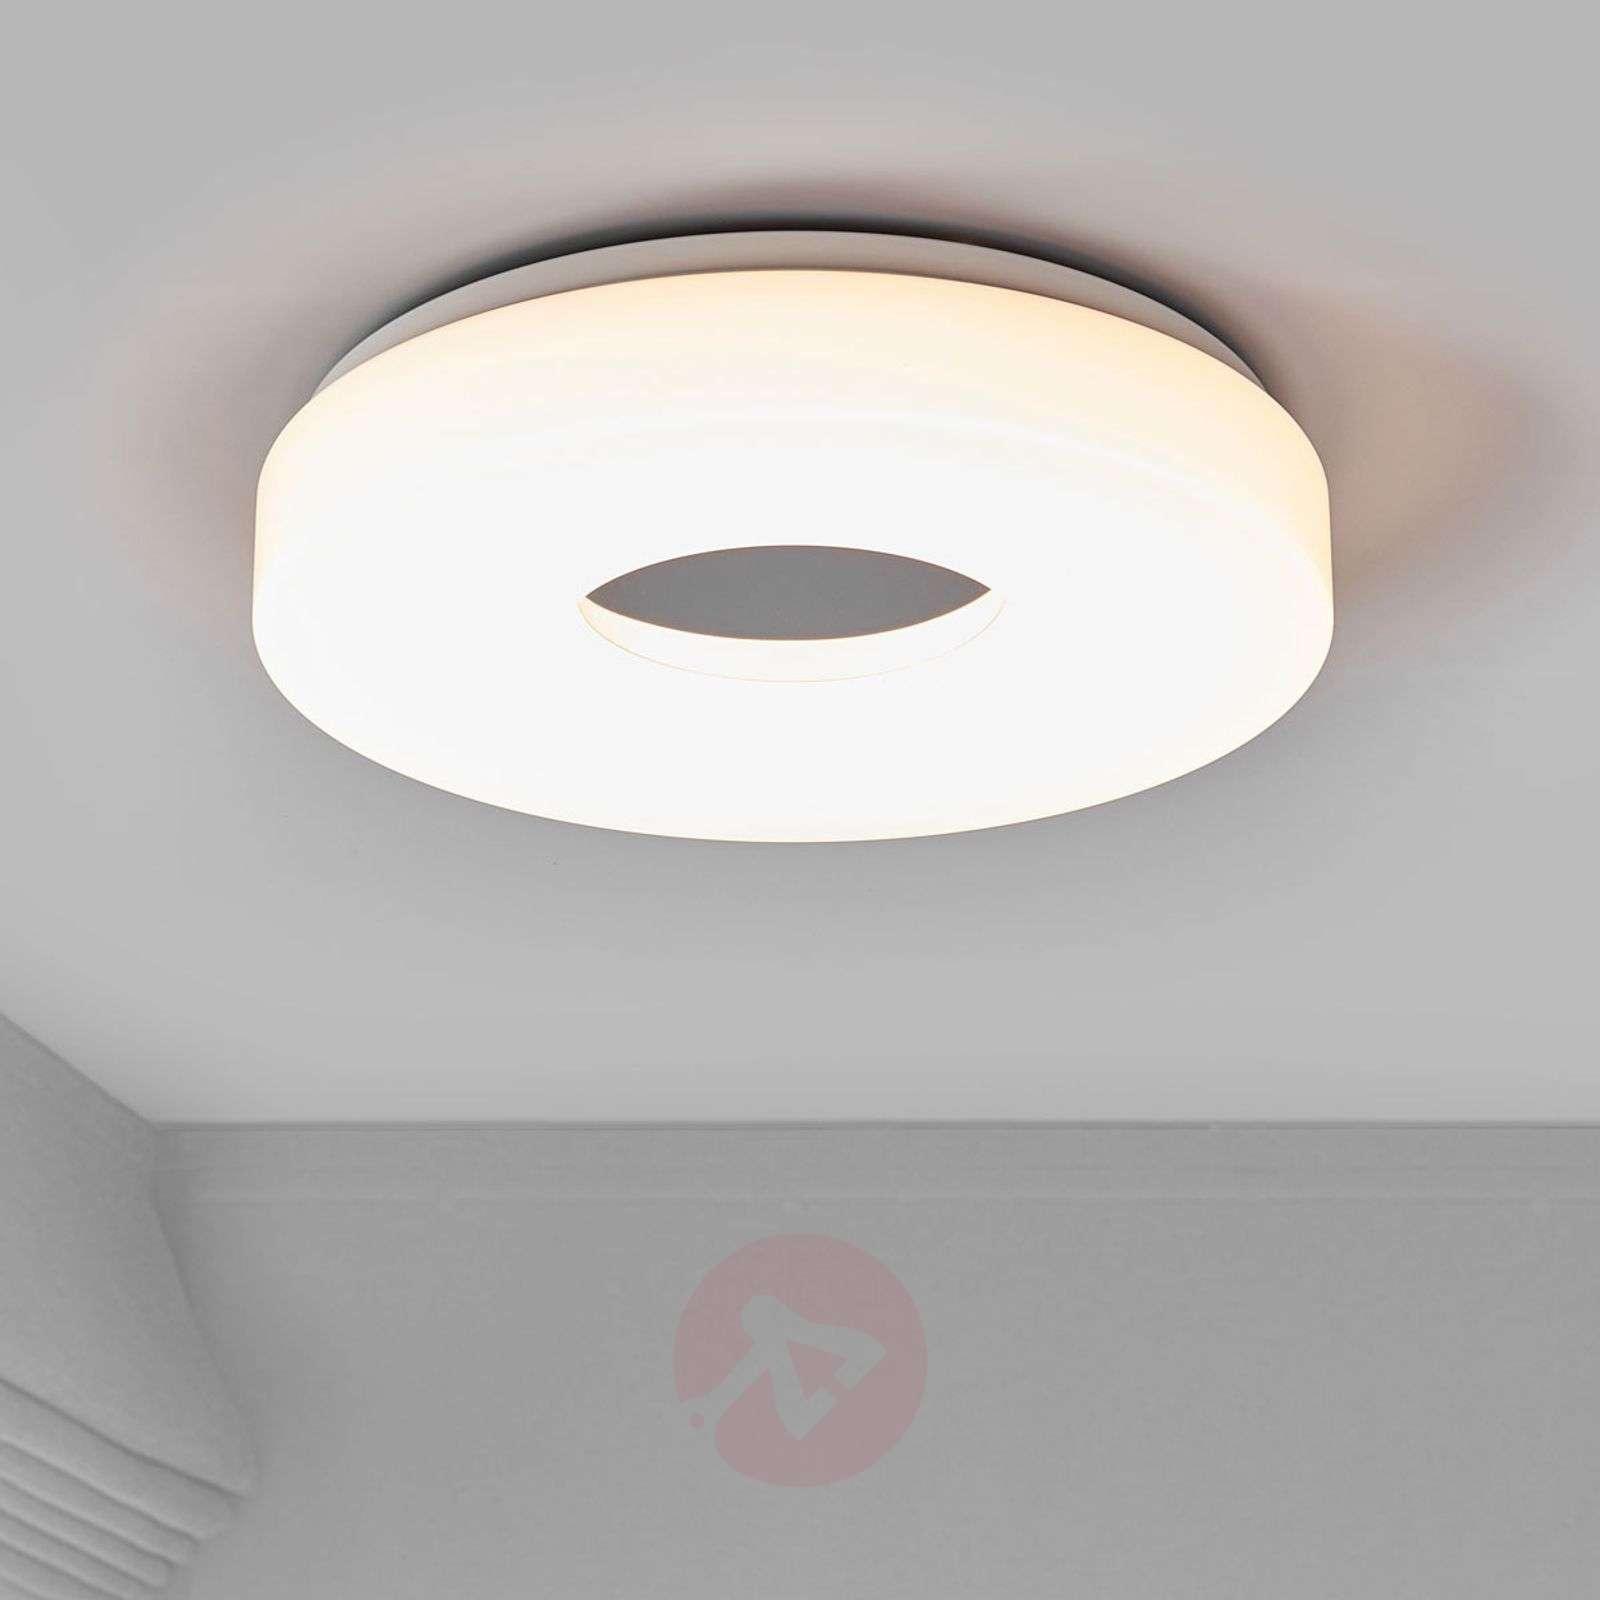 Modern Cuneo bathroom-ceiling light with LED-3006264-01